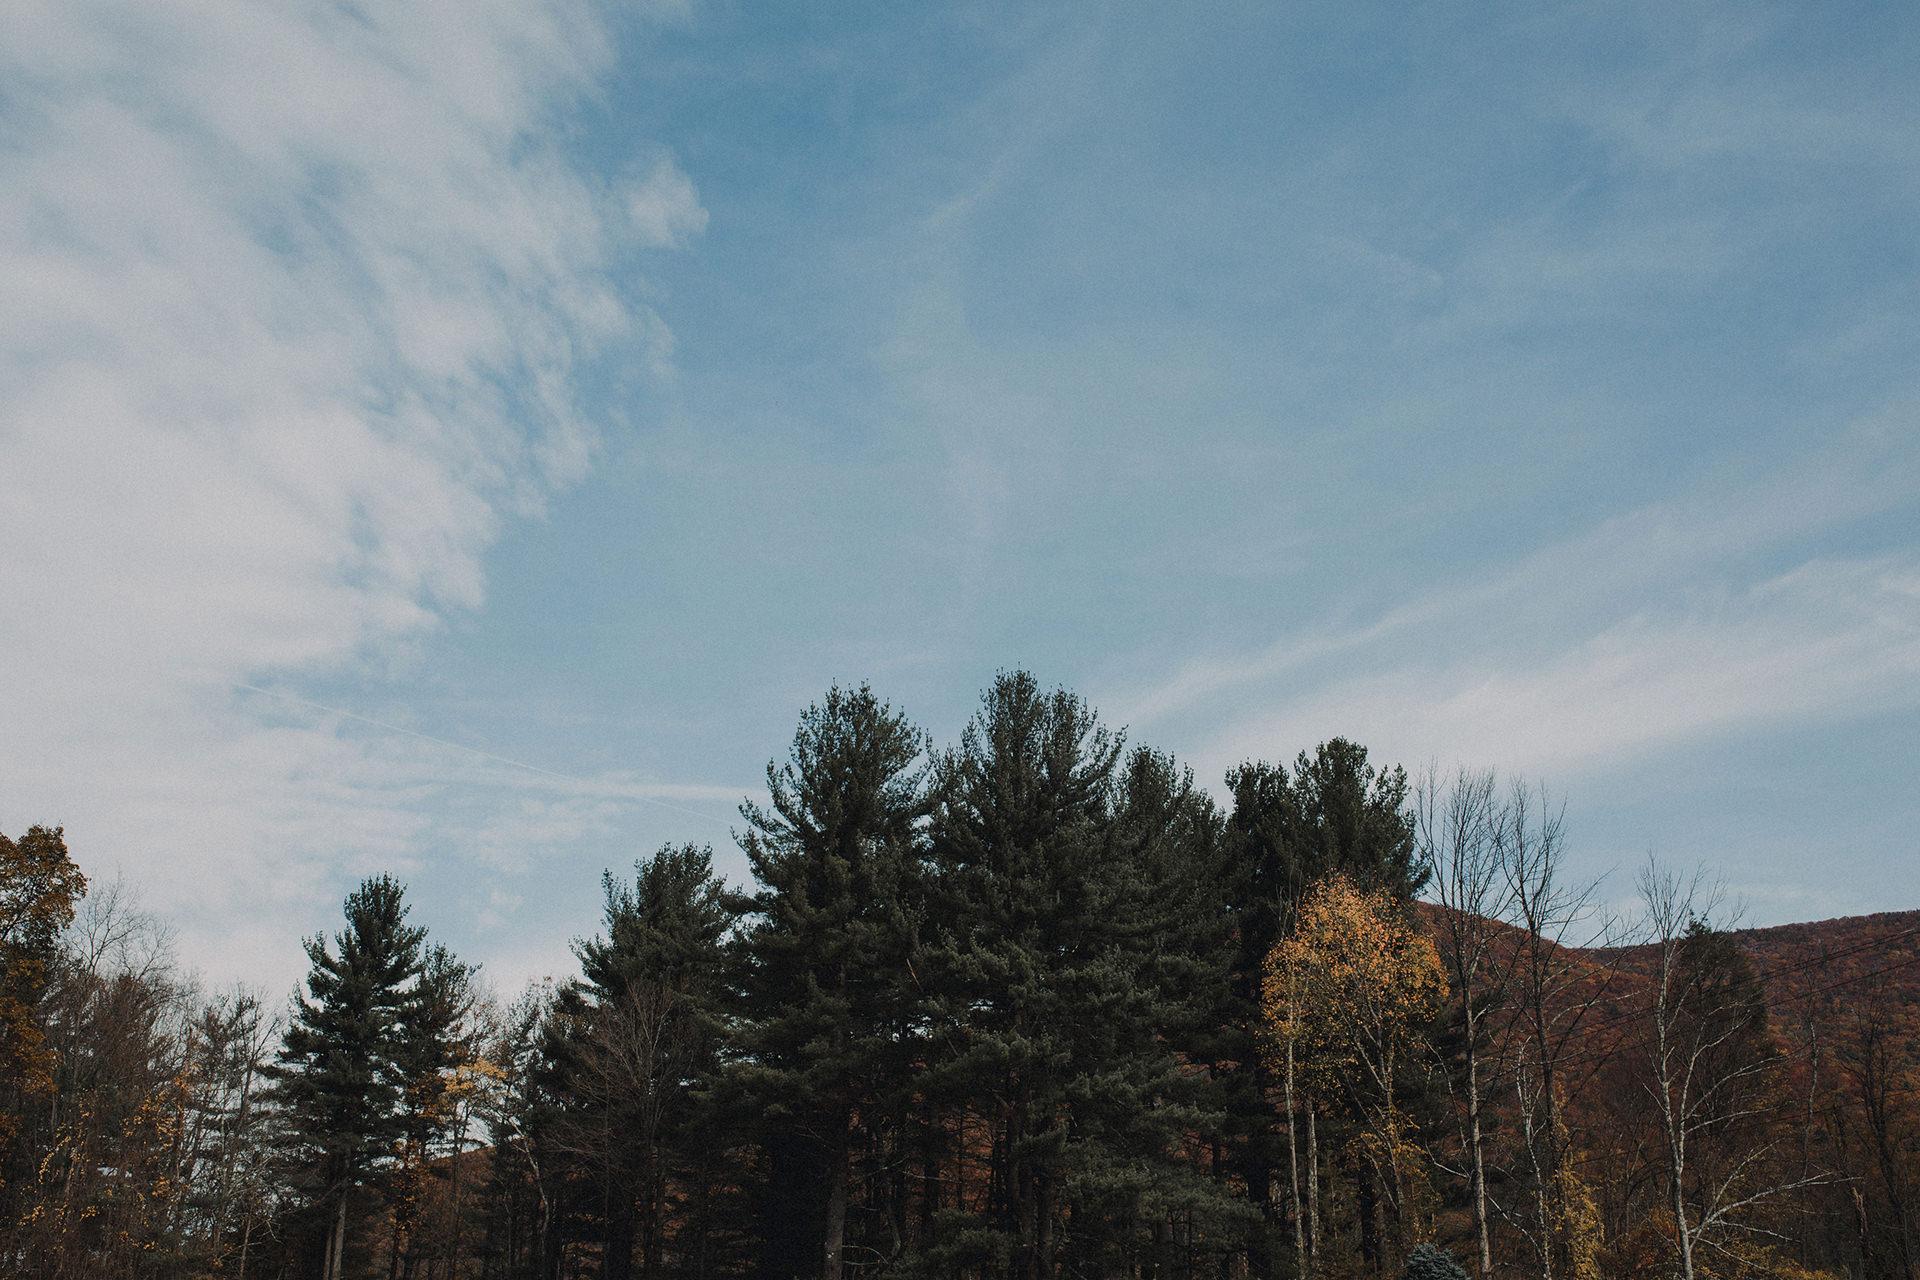 Weddind_catskills_mountain_newyjersey-4.jpg